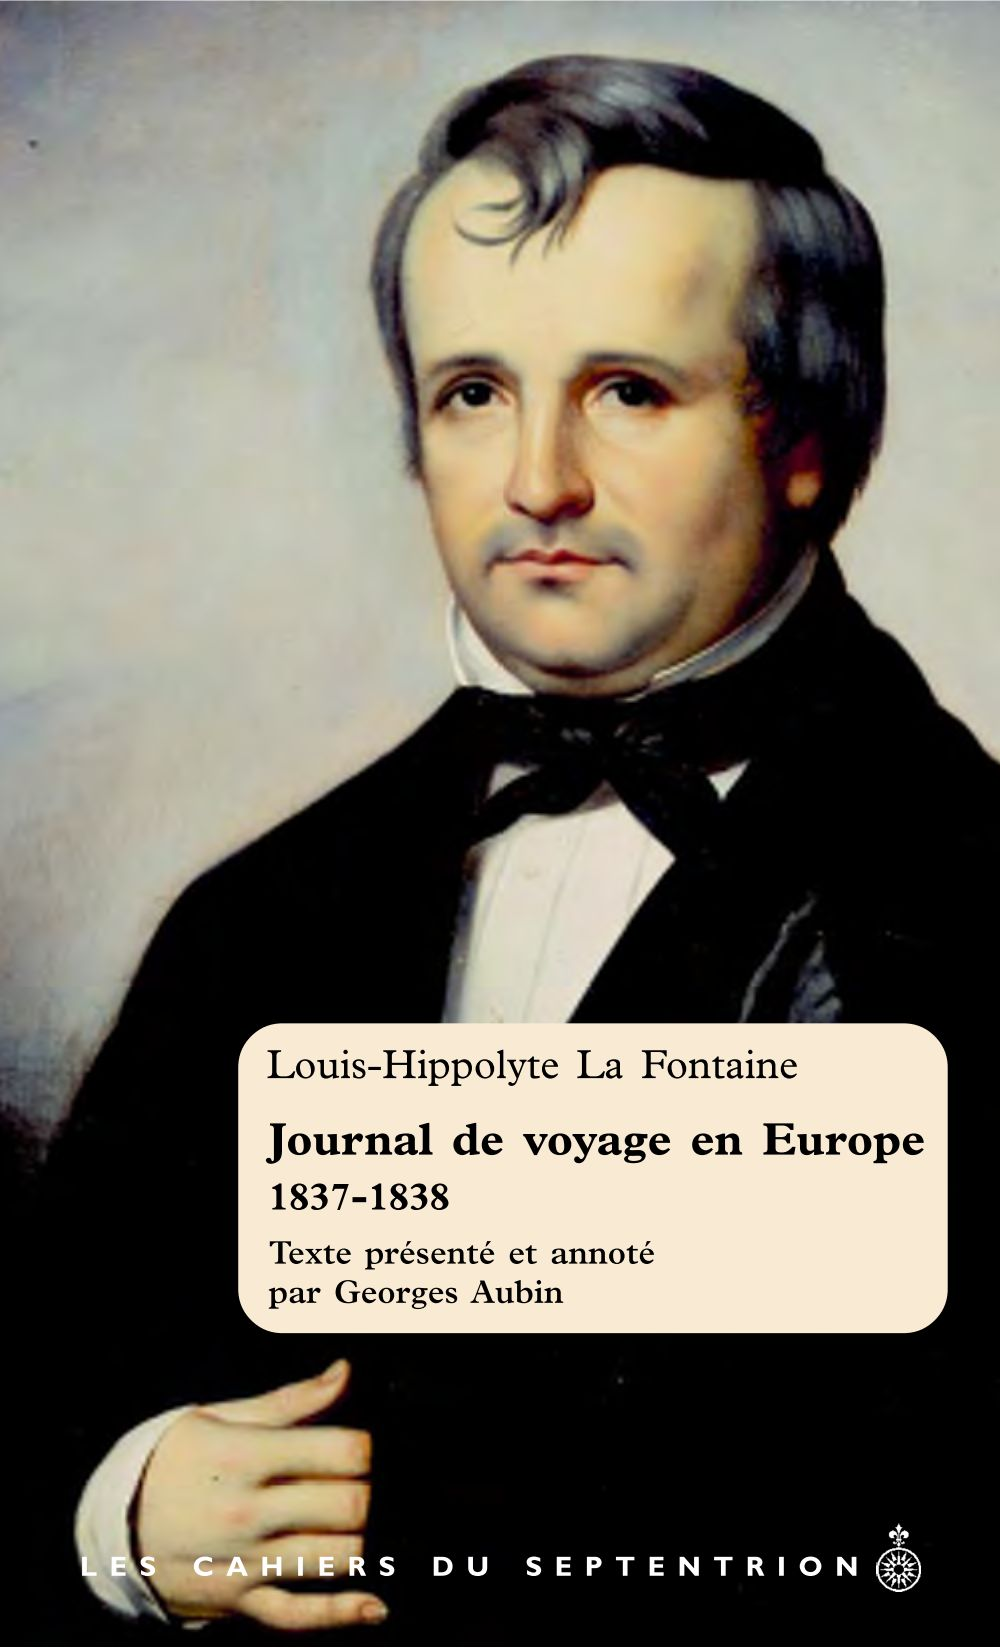 Journal de voyage en Europe, 1837-1838